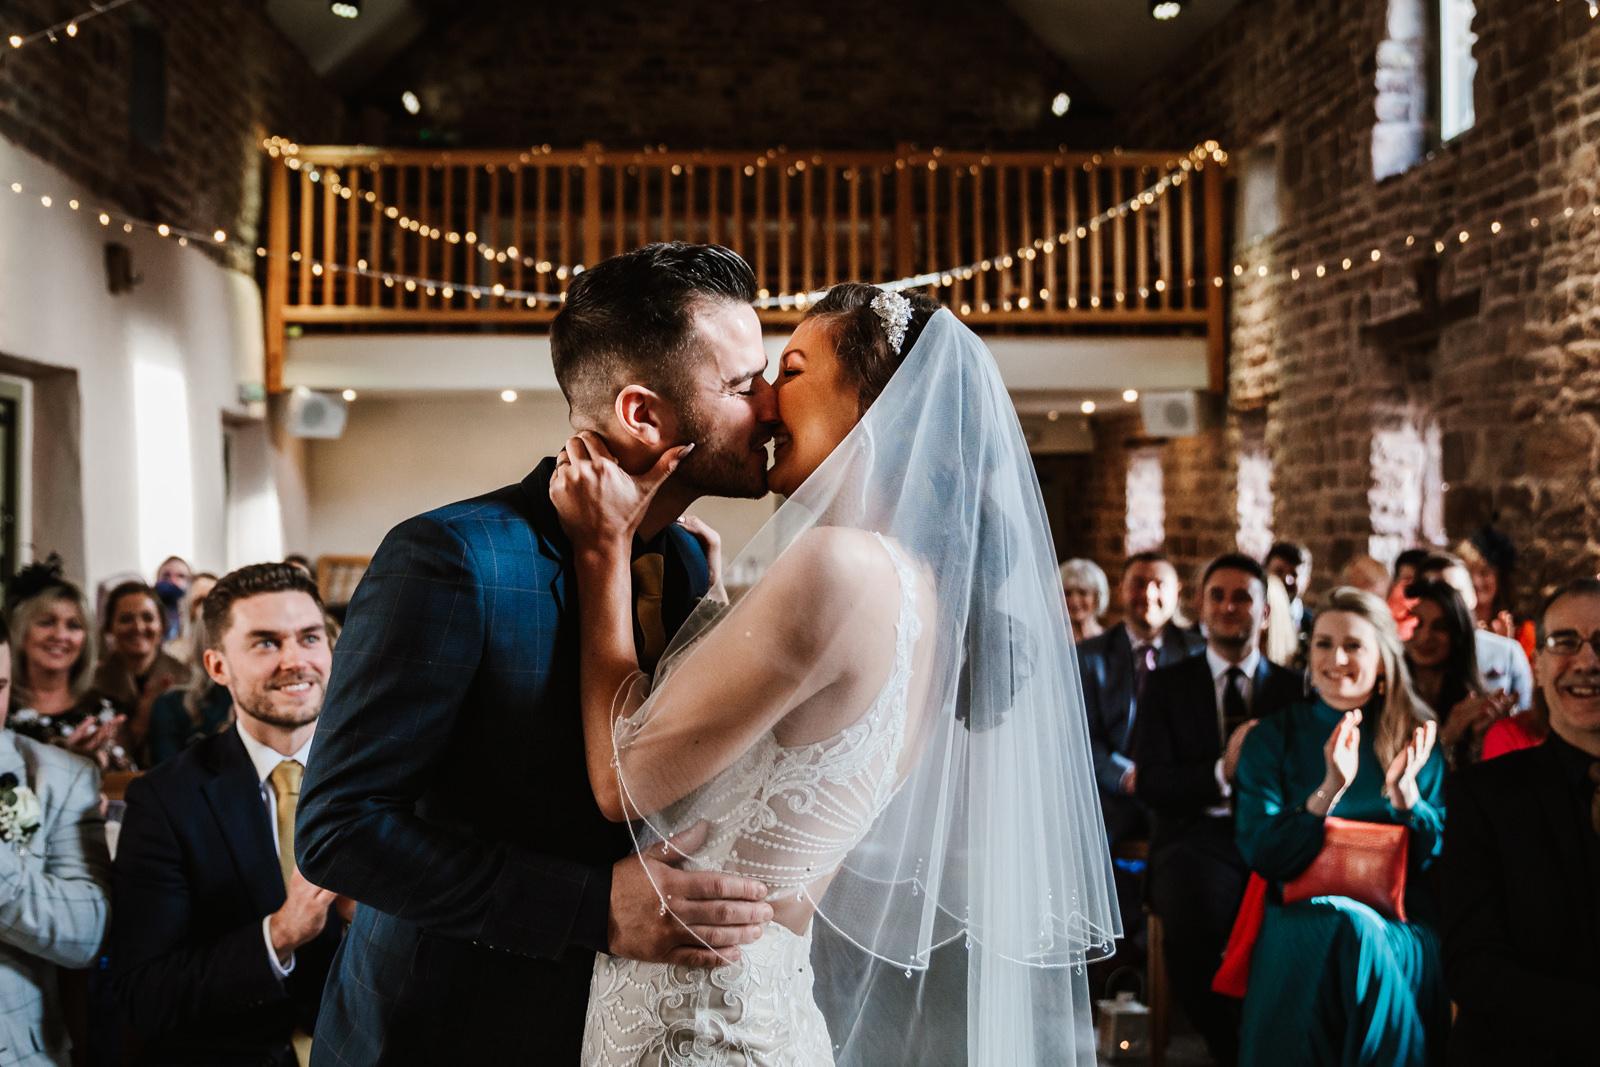 First kiss at the Ashes Barns